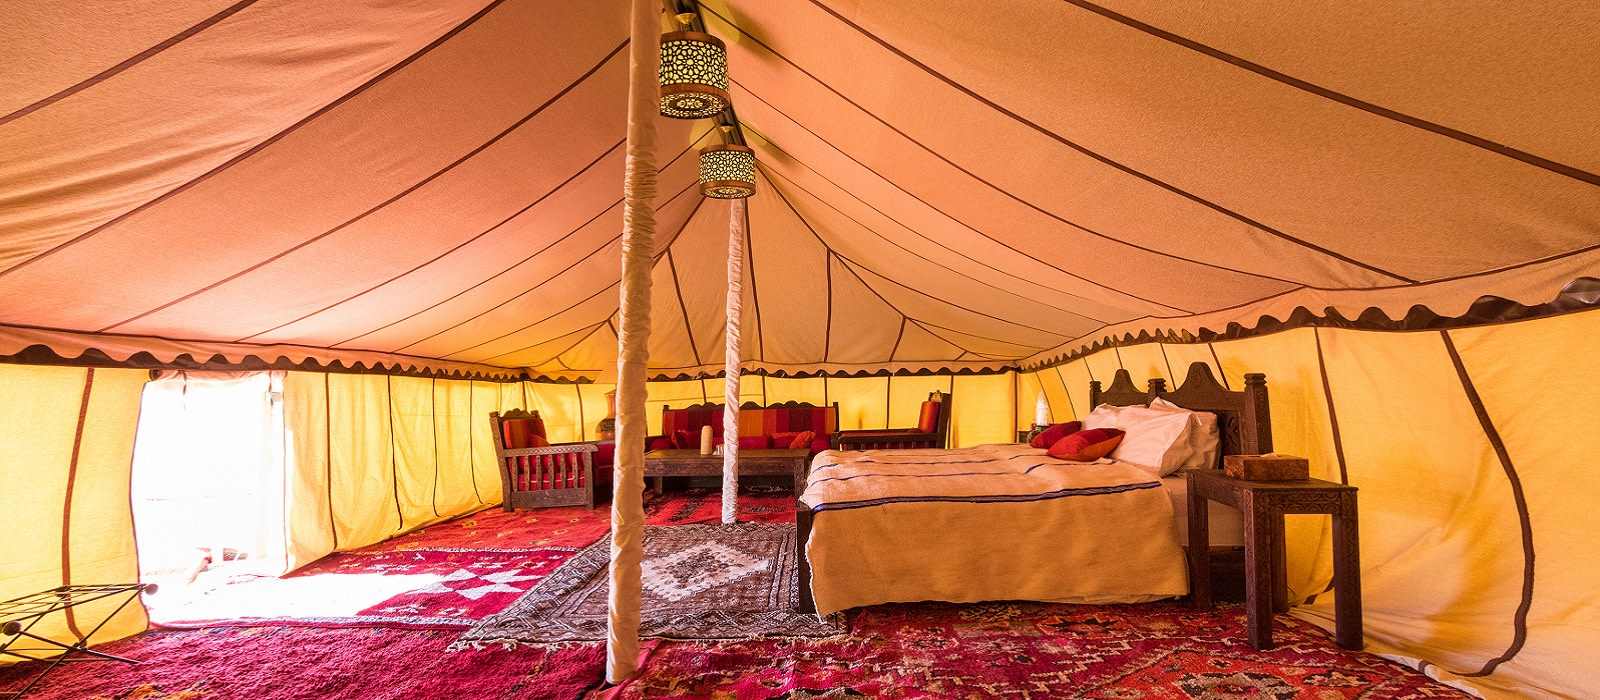 Hotel Desert Luxury Camp Morocco